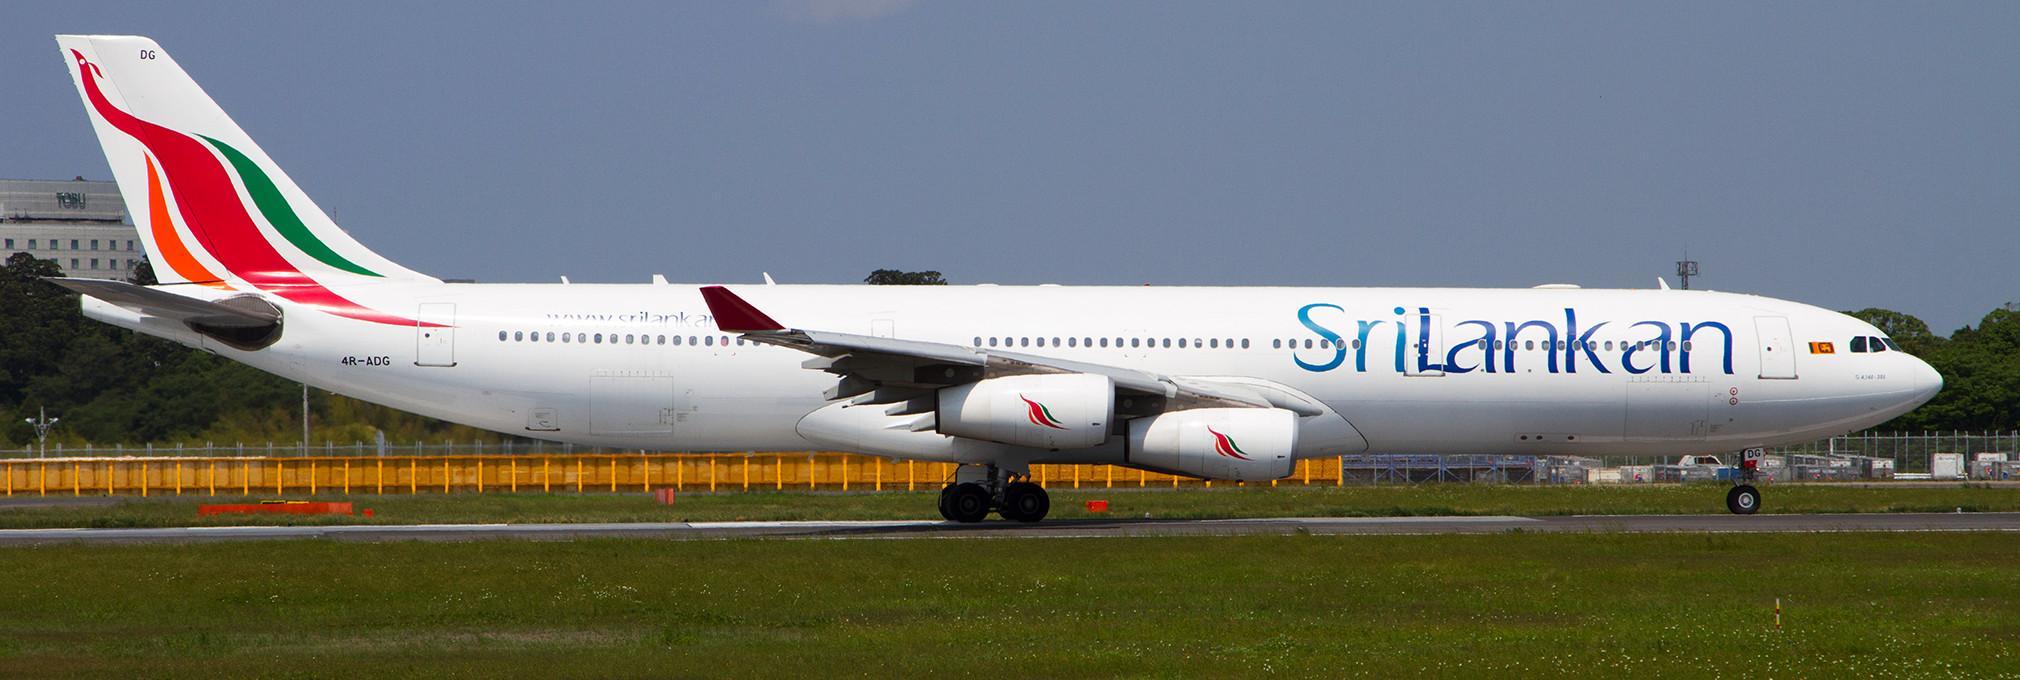 Srilankan Airlines- aereo